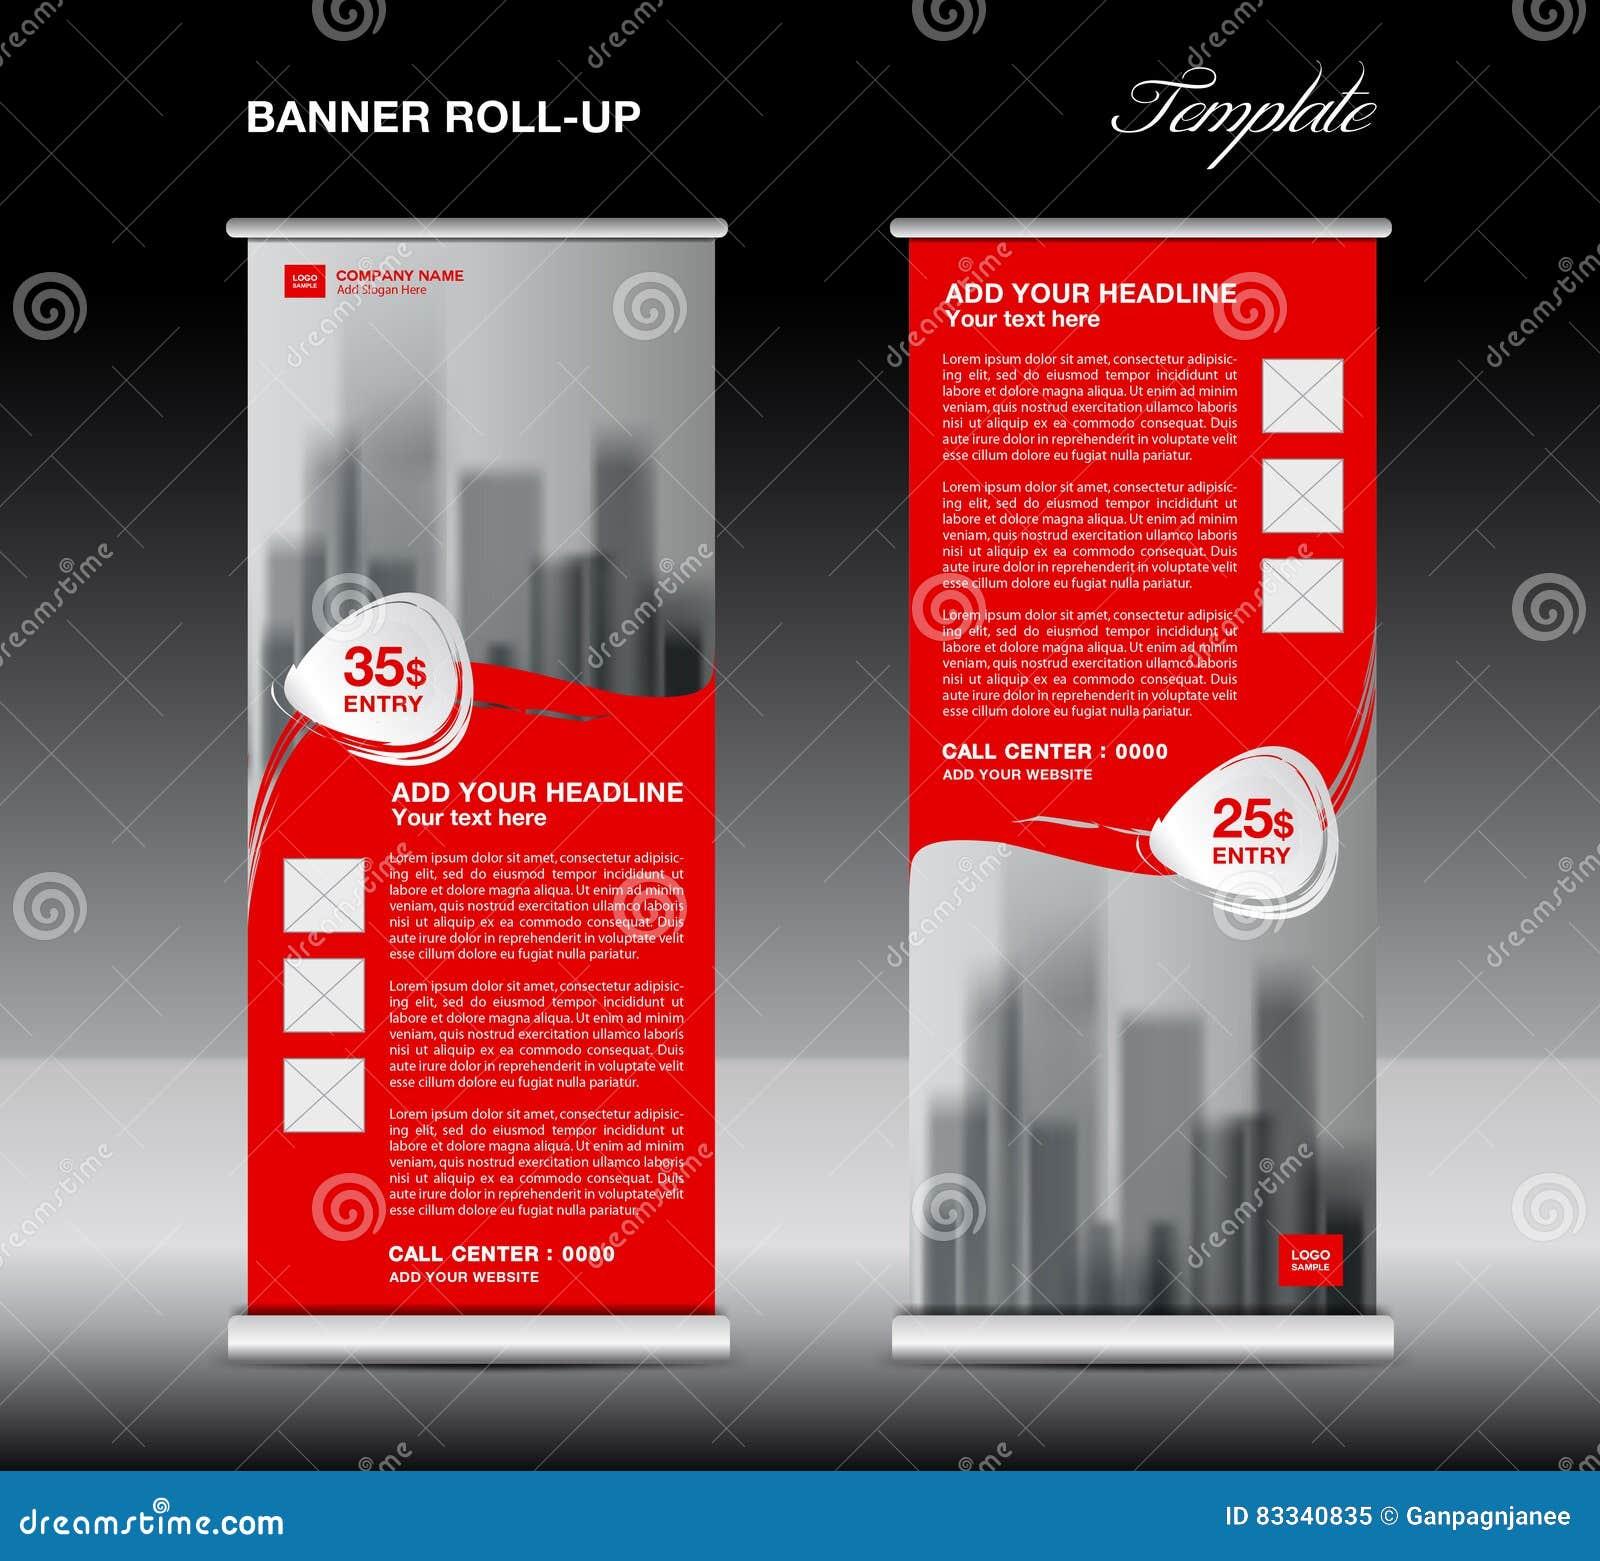 red roll up banner template vector flyer advertisement poster stock vector illustration. Black Bedroom Furniture Sets. Home Design Ideas